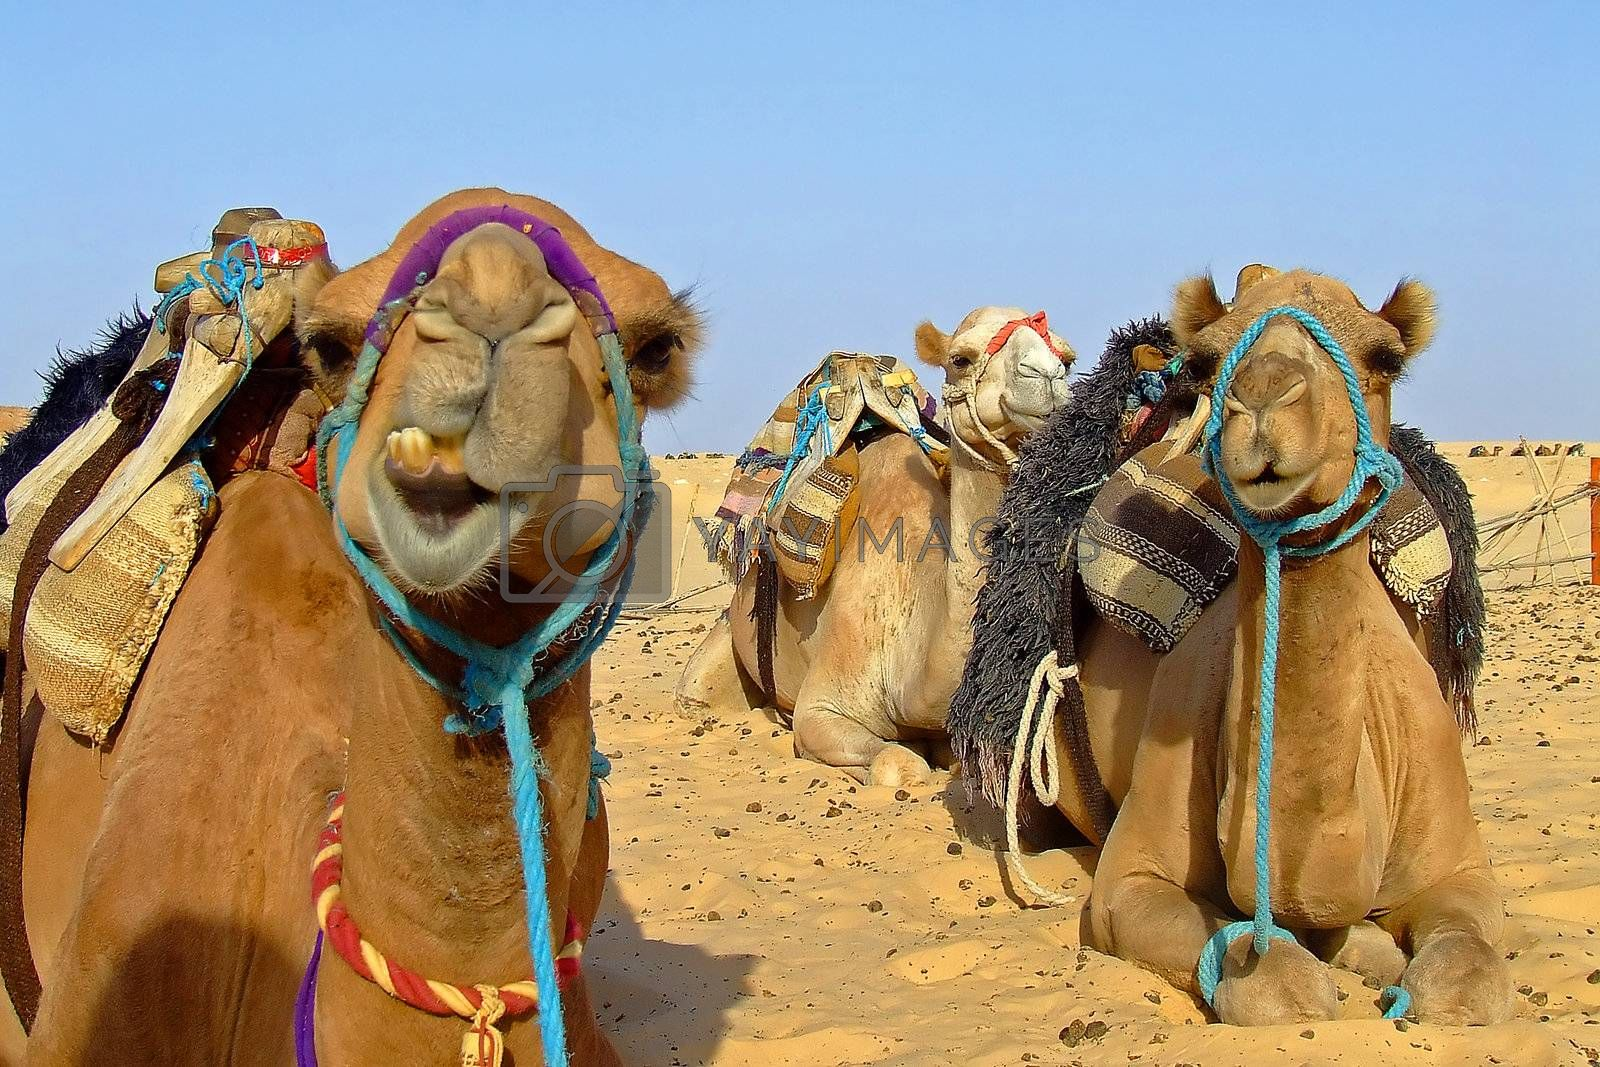 Camel on sahara by PauloResende